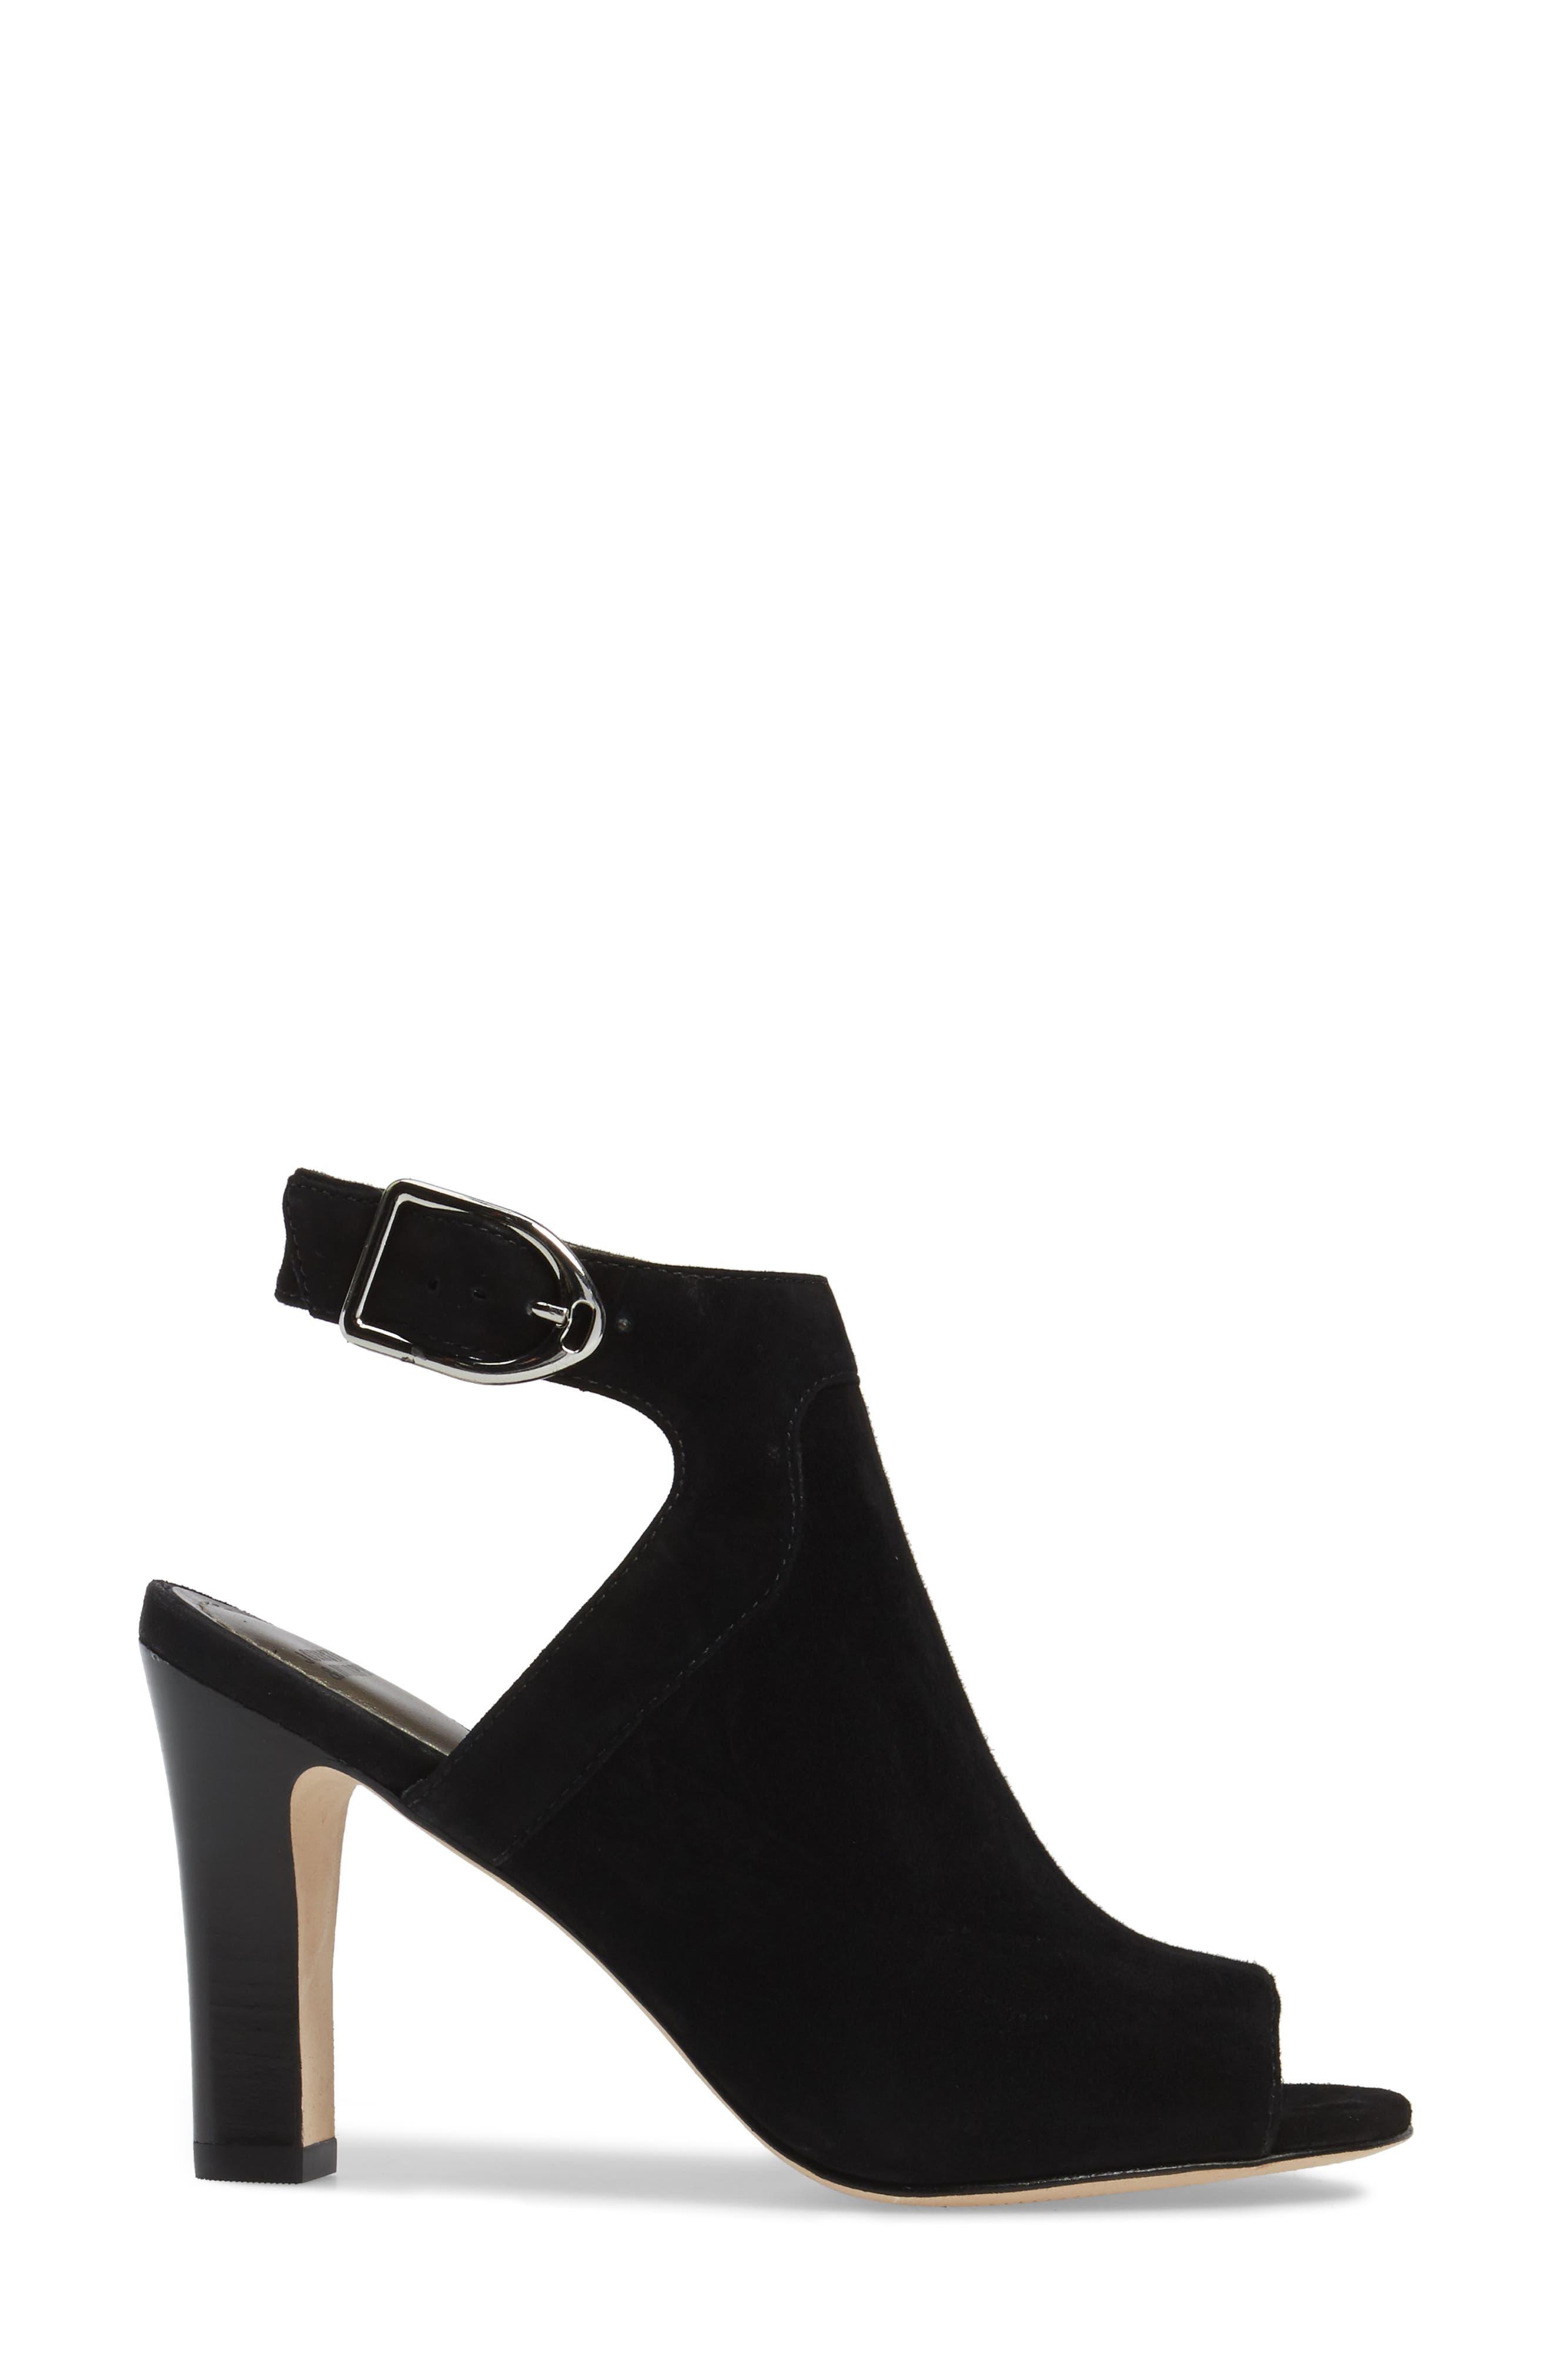 Cassie Peep Toe Sandal,                             Alternate thumbnail 3, color,                             BLACK LEATHER